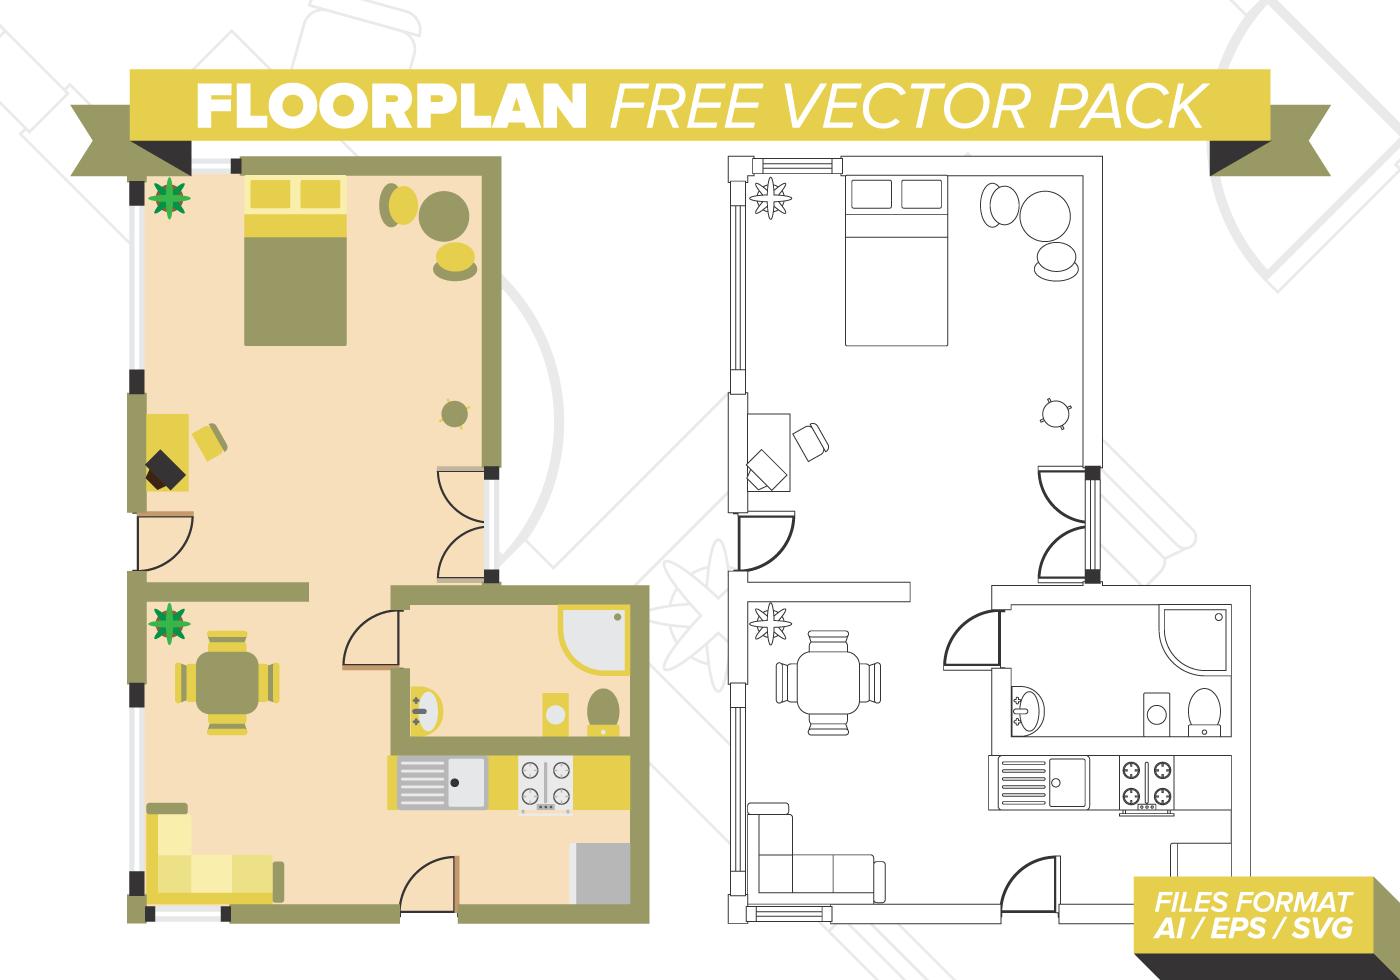 Floorplan Free Vector Pack Download Free Vector Art